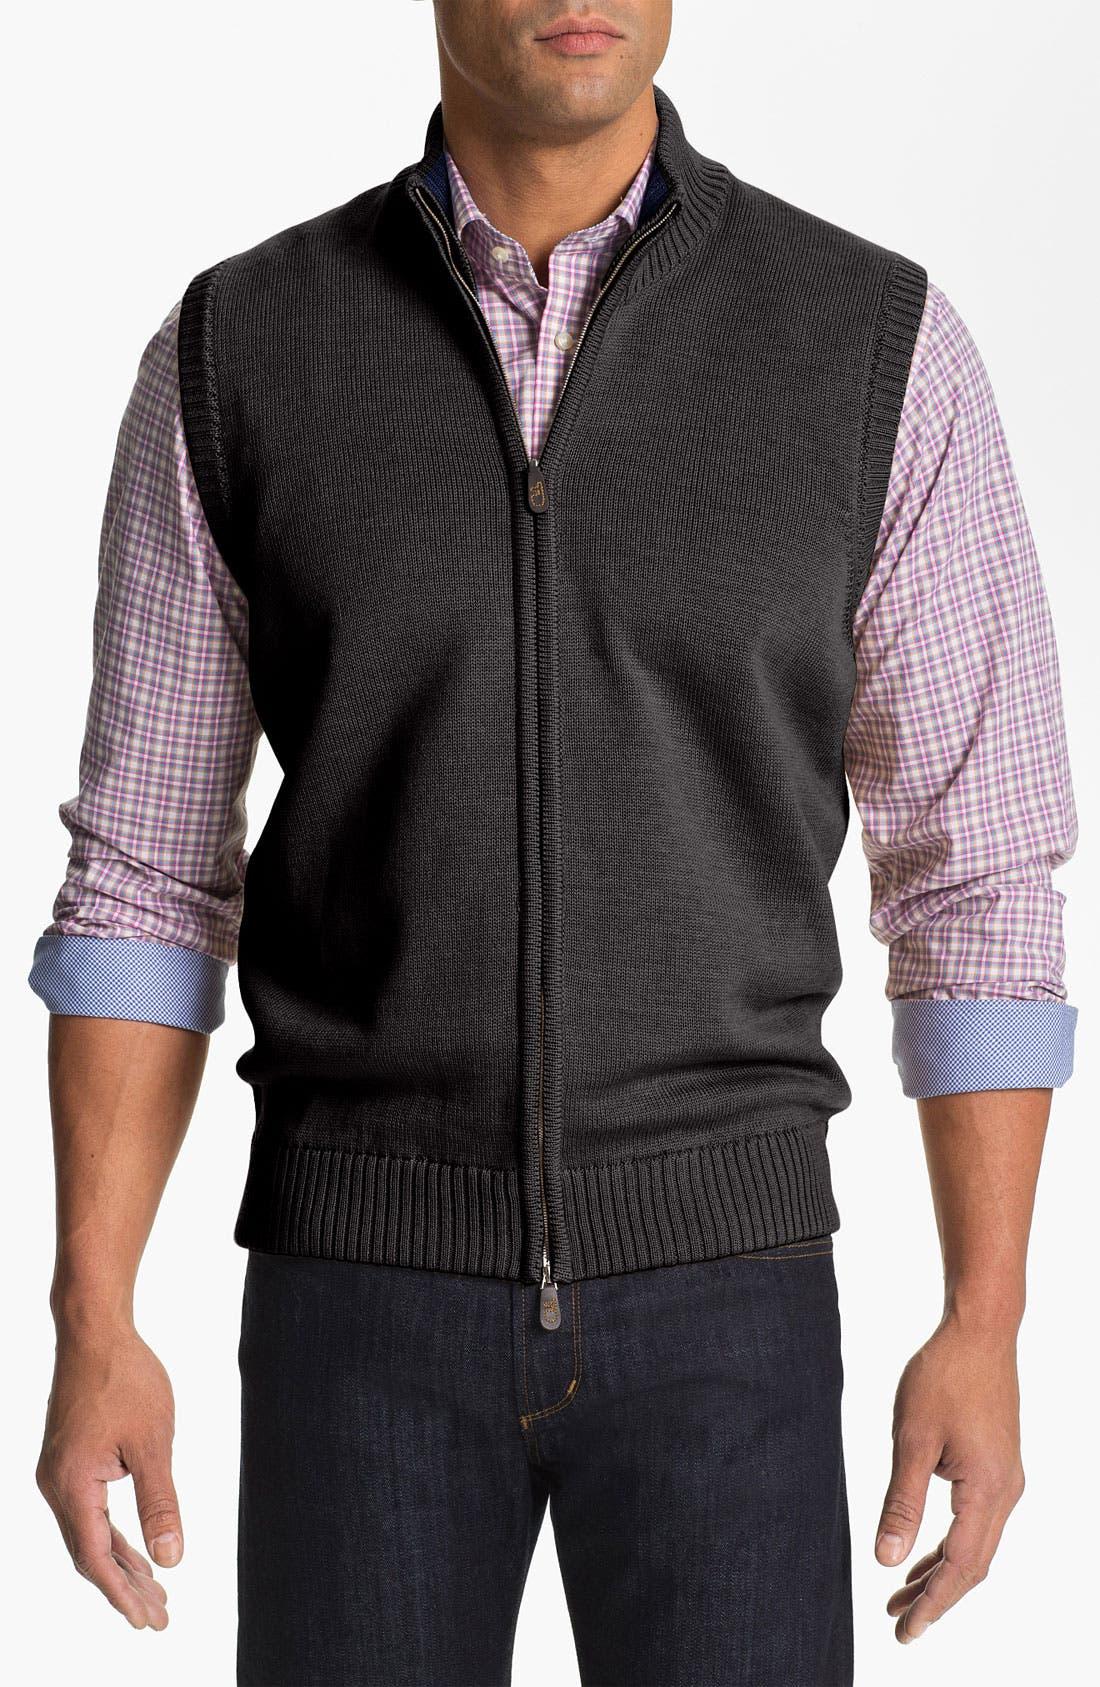 Main Image - Thomas Dean Zip Front Wool Sweater Vest